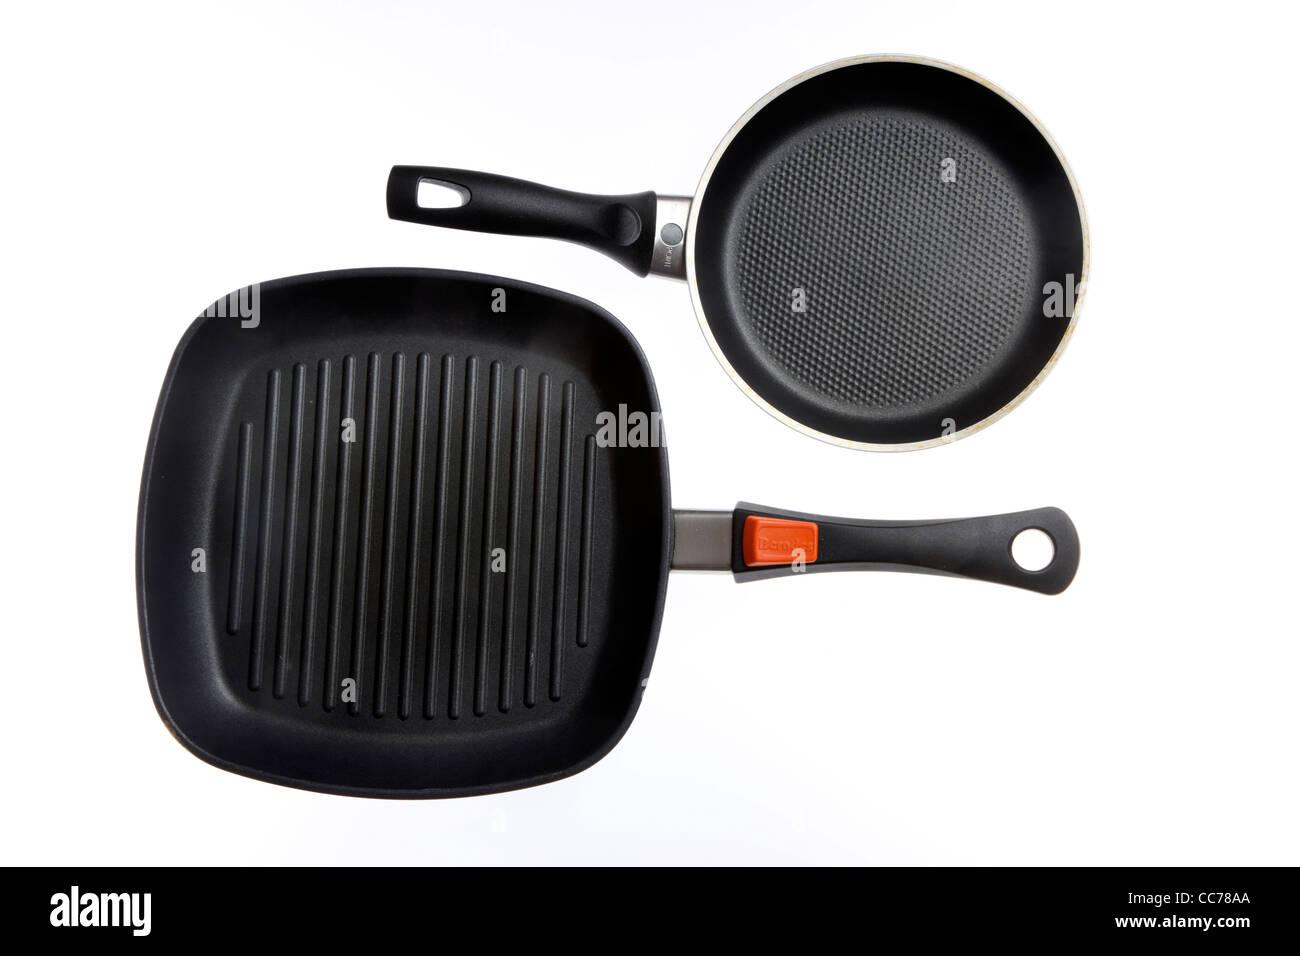 Compilation of various kitchen utensils, kitchen tools. Teflon pans. Steak pan. - Stock Image